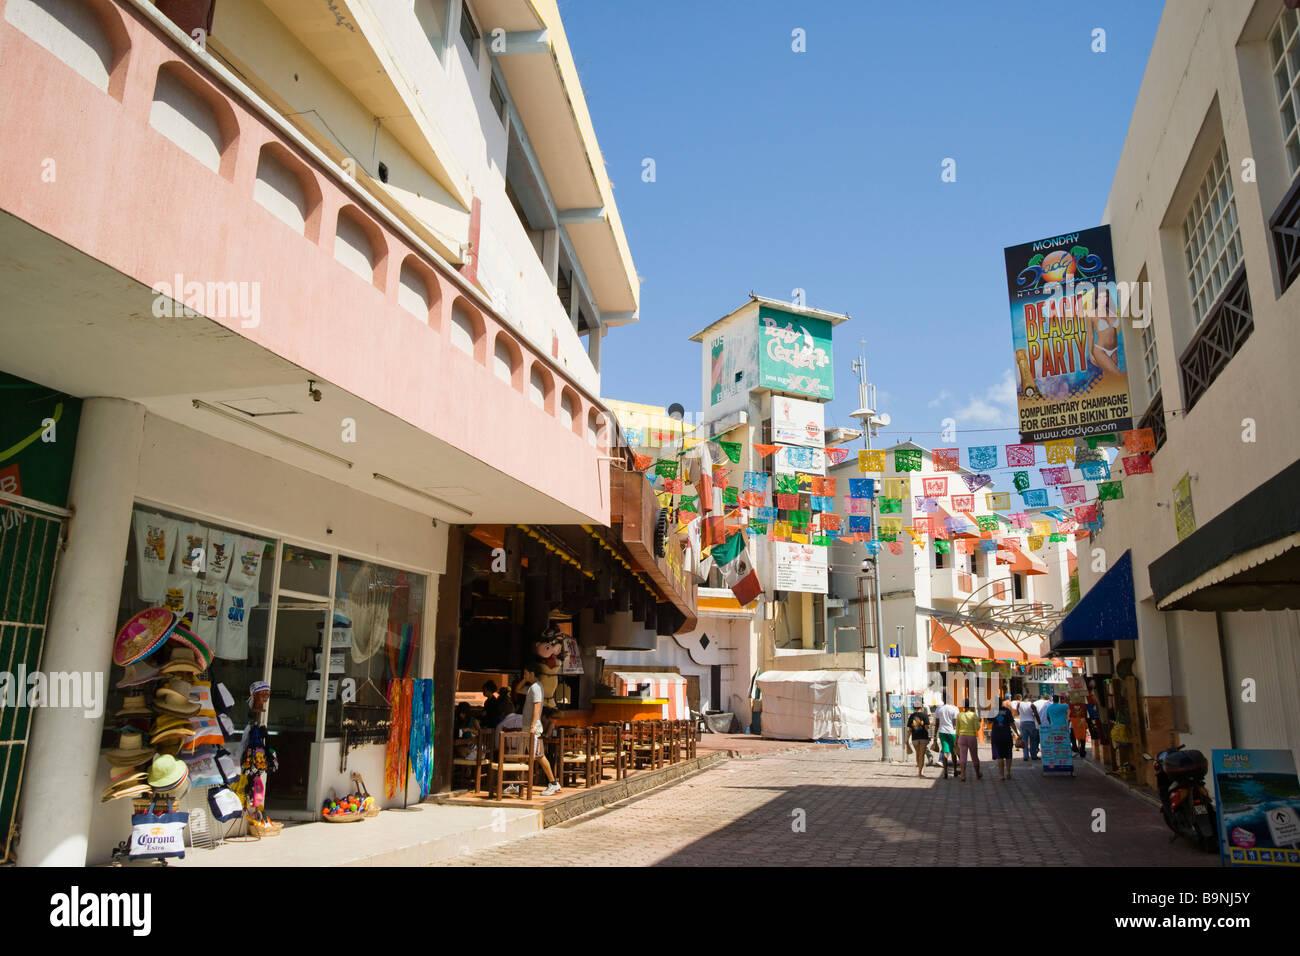 Mexico Yucatan - Cancun zona hotelara or hotel zone main centre near the Forum shopping mall market area Stock Photo